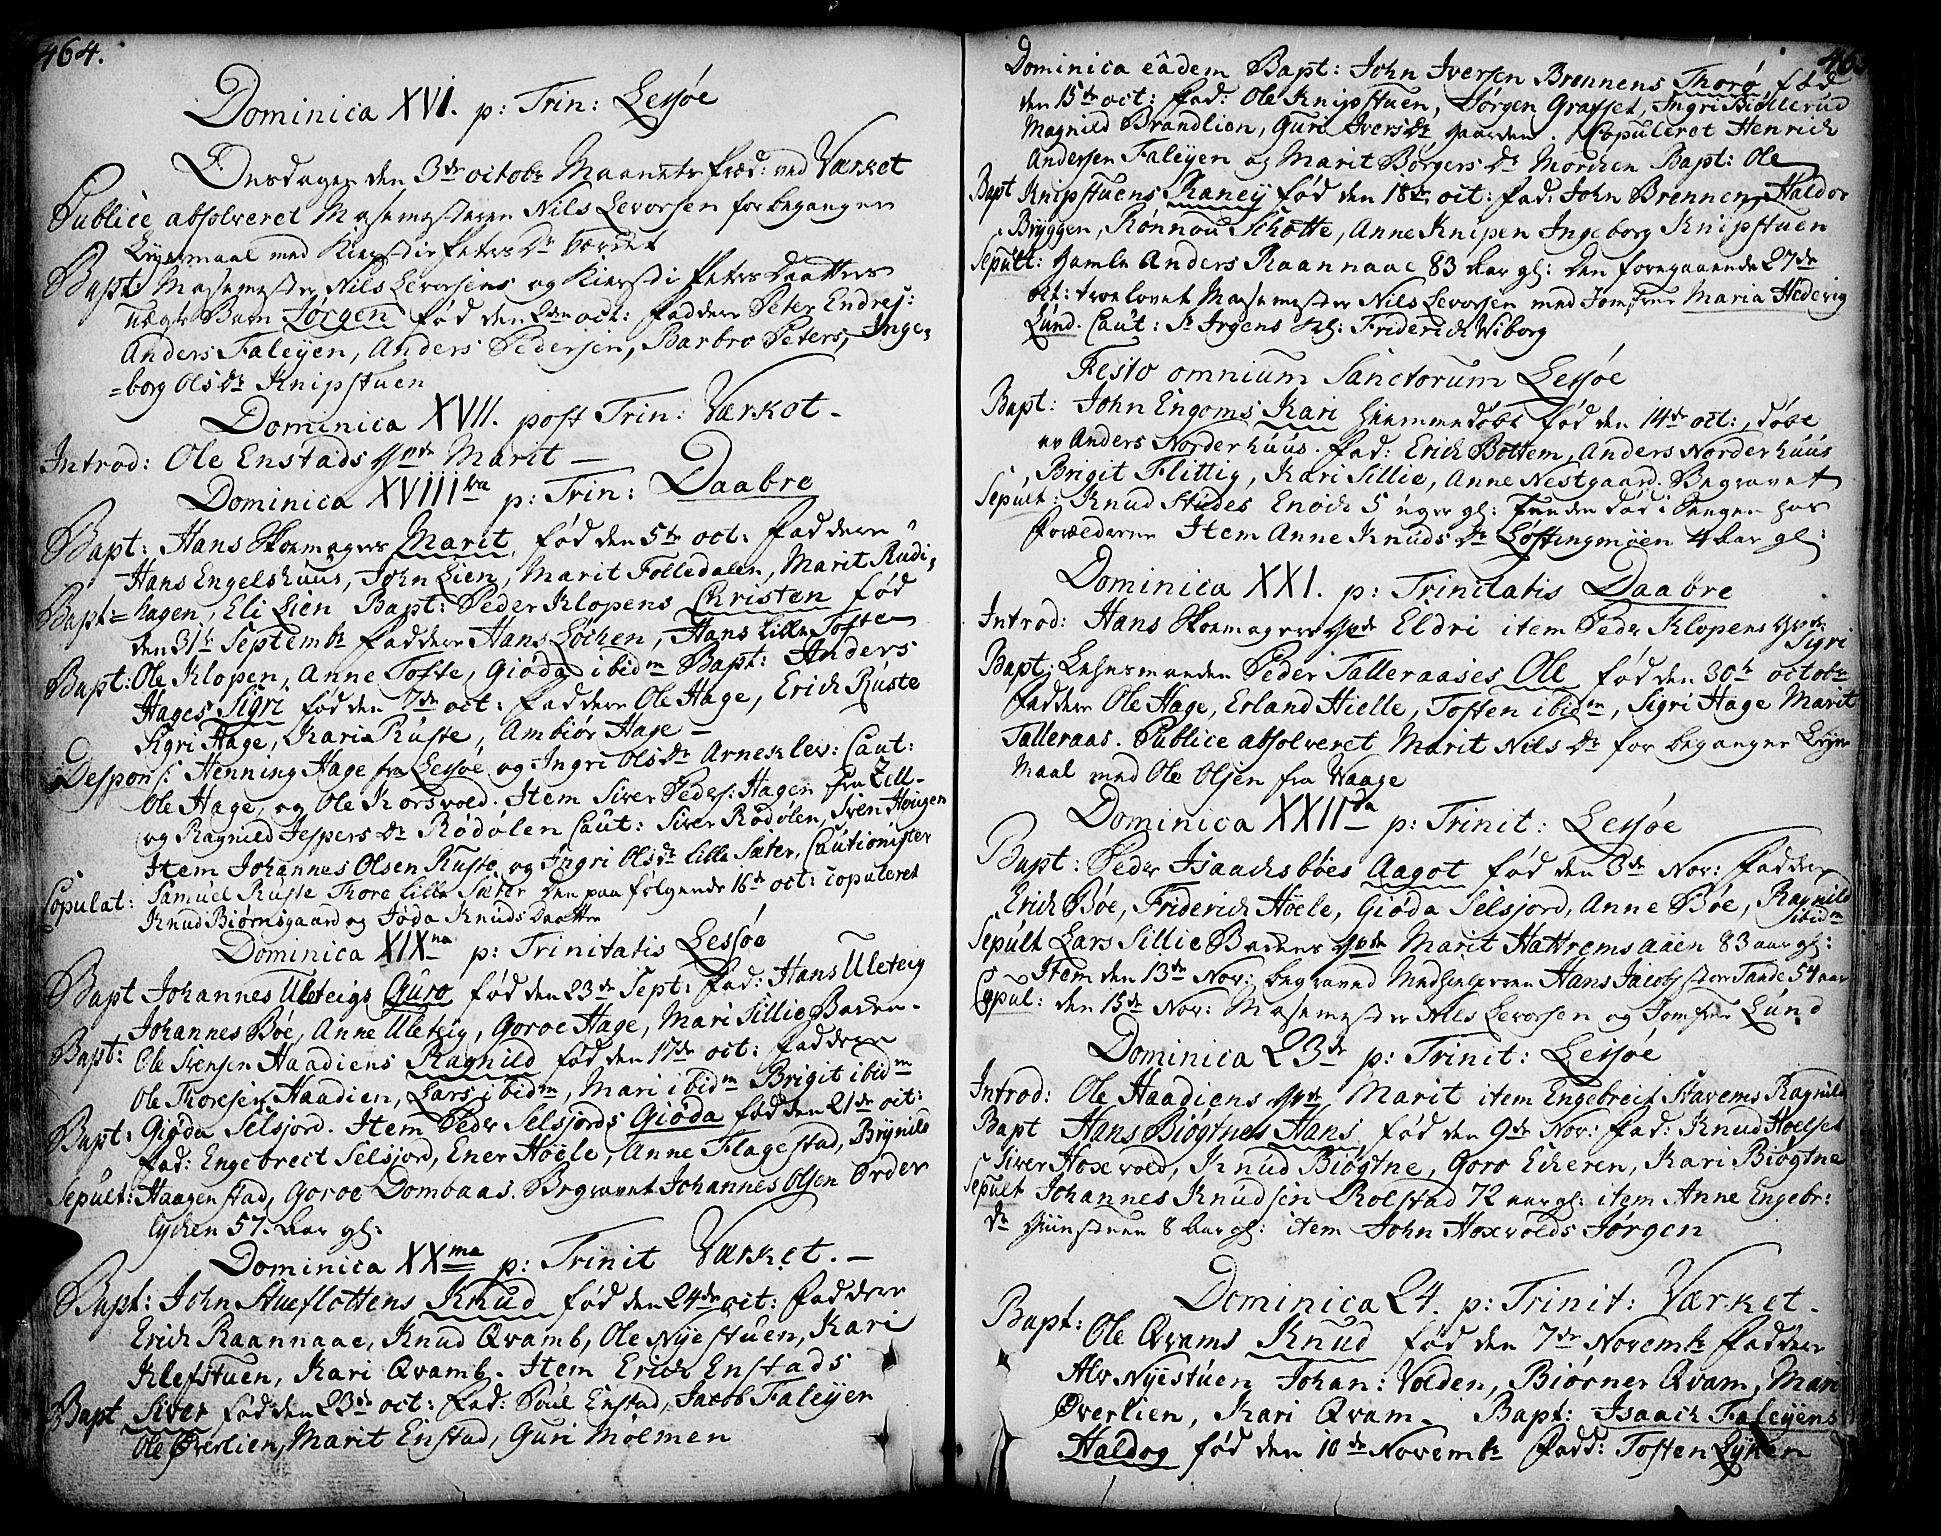 SAH, Lesja prestekontor, Ministerialbok nr. 2, 1732-1776, s. 464-465